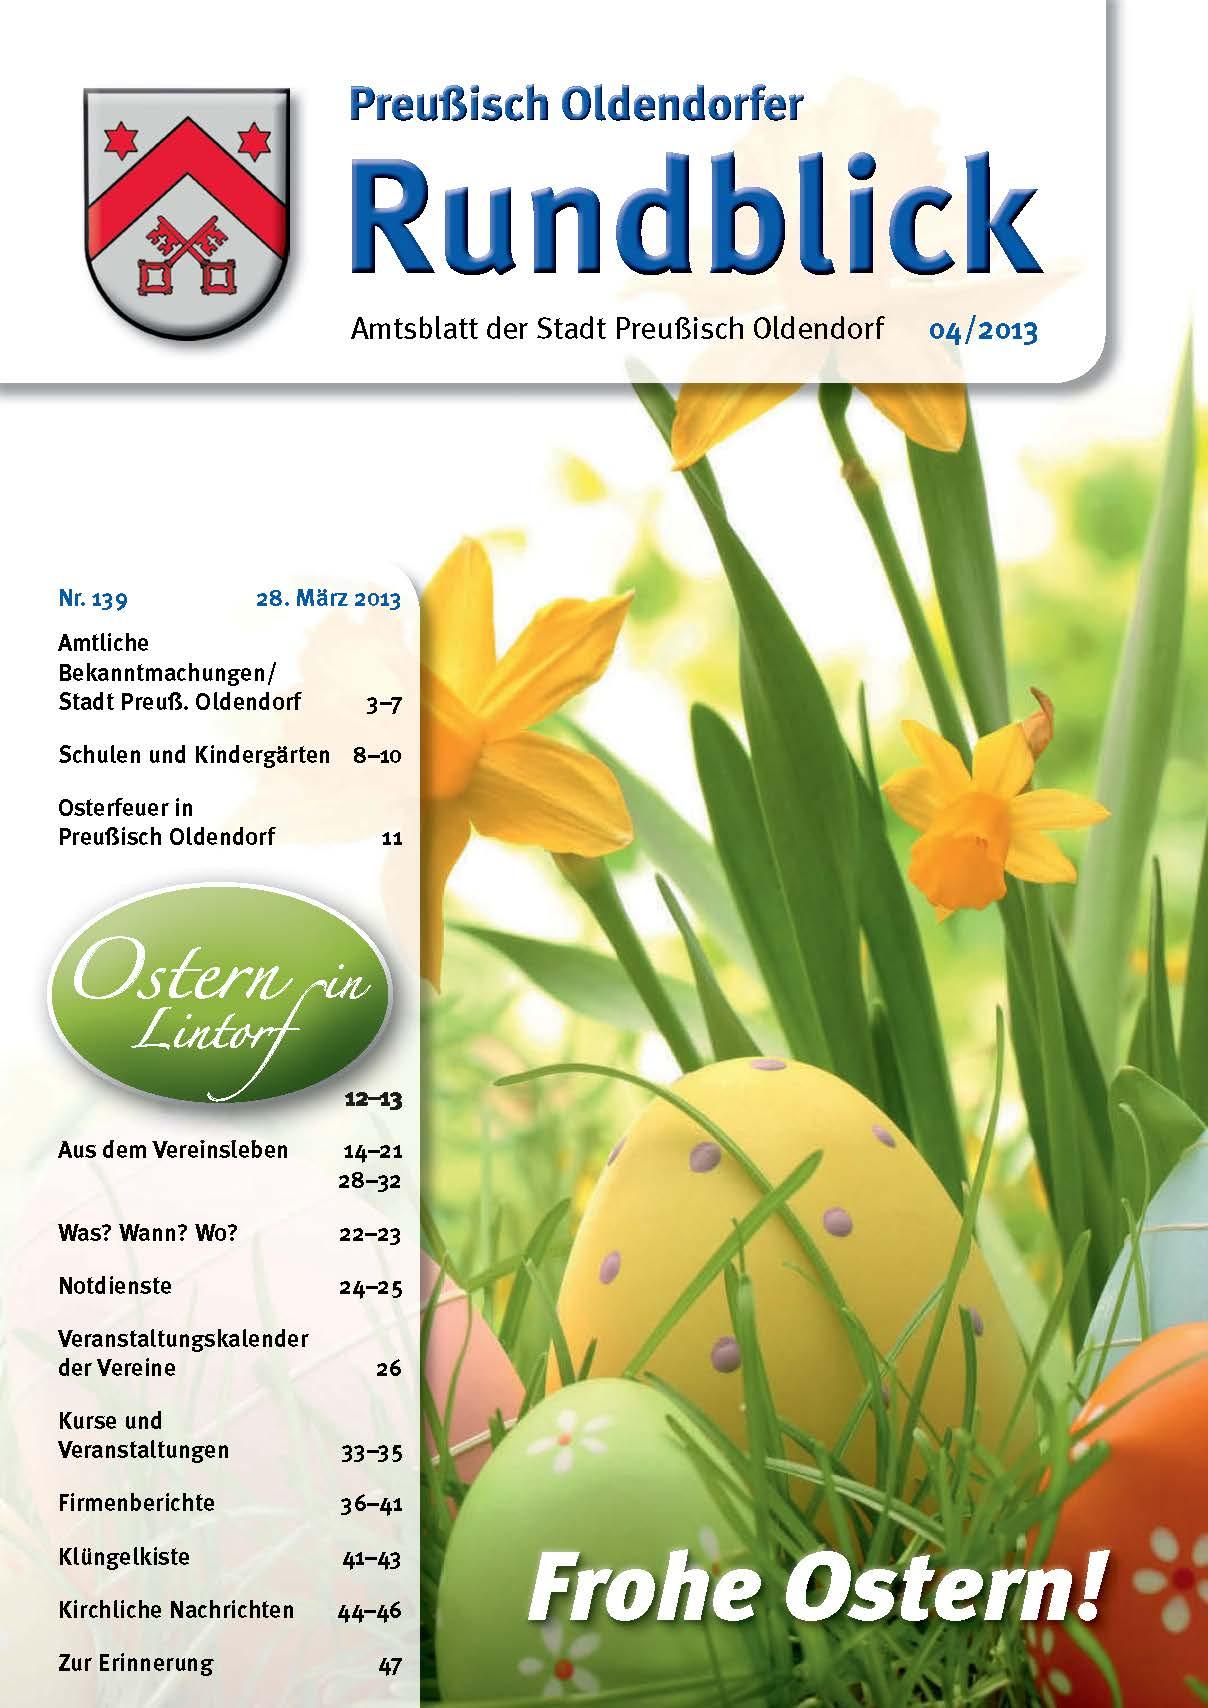 Rundblick 4-2013 Titel